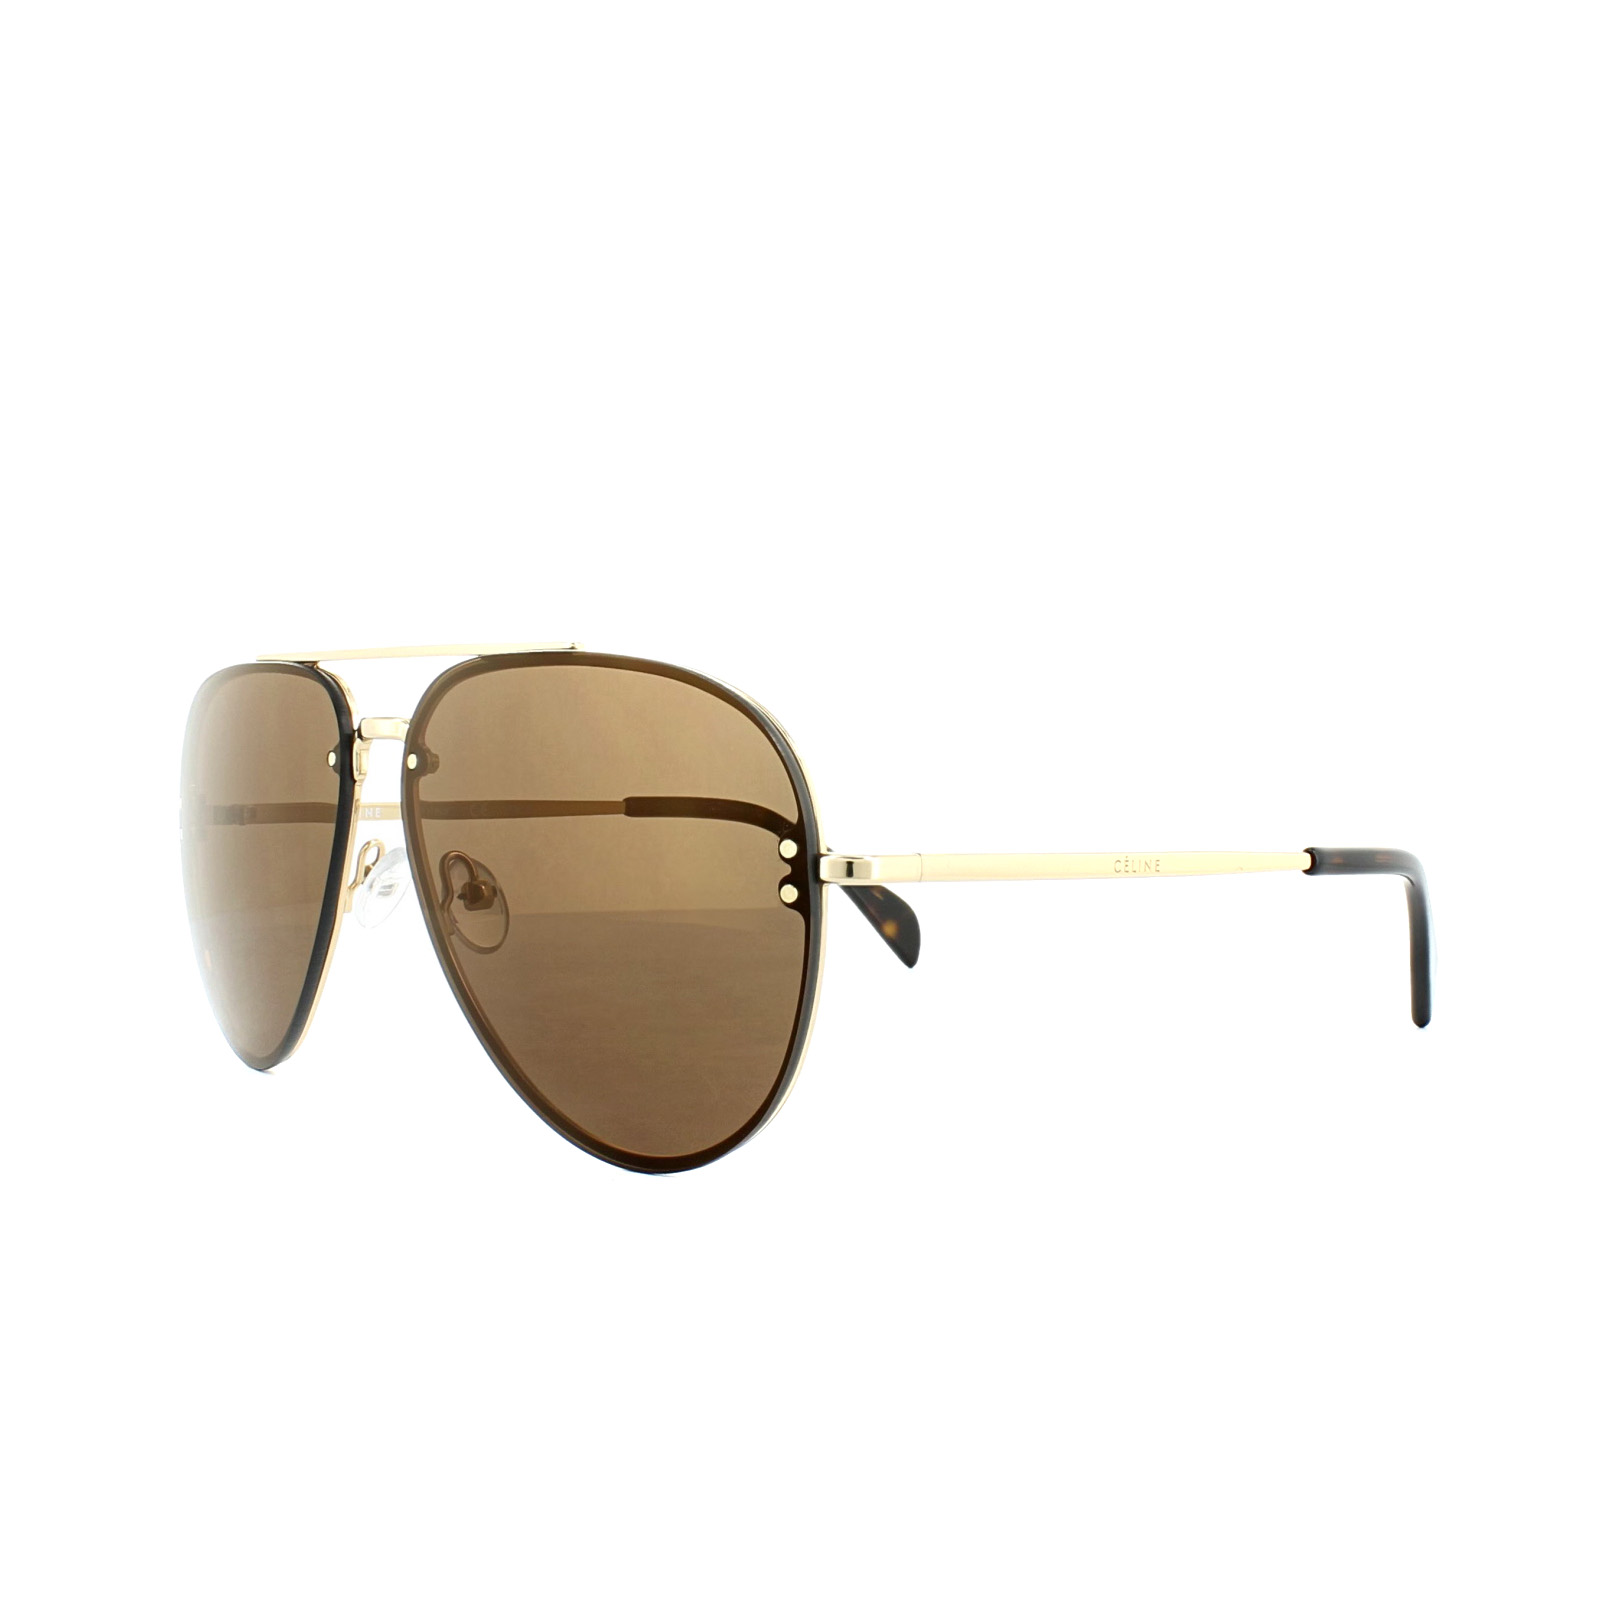 11bd9a1811b Cheap Celine 41391 S Mirror Sunglasses - Discounted Sunglasses